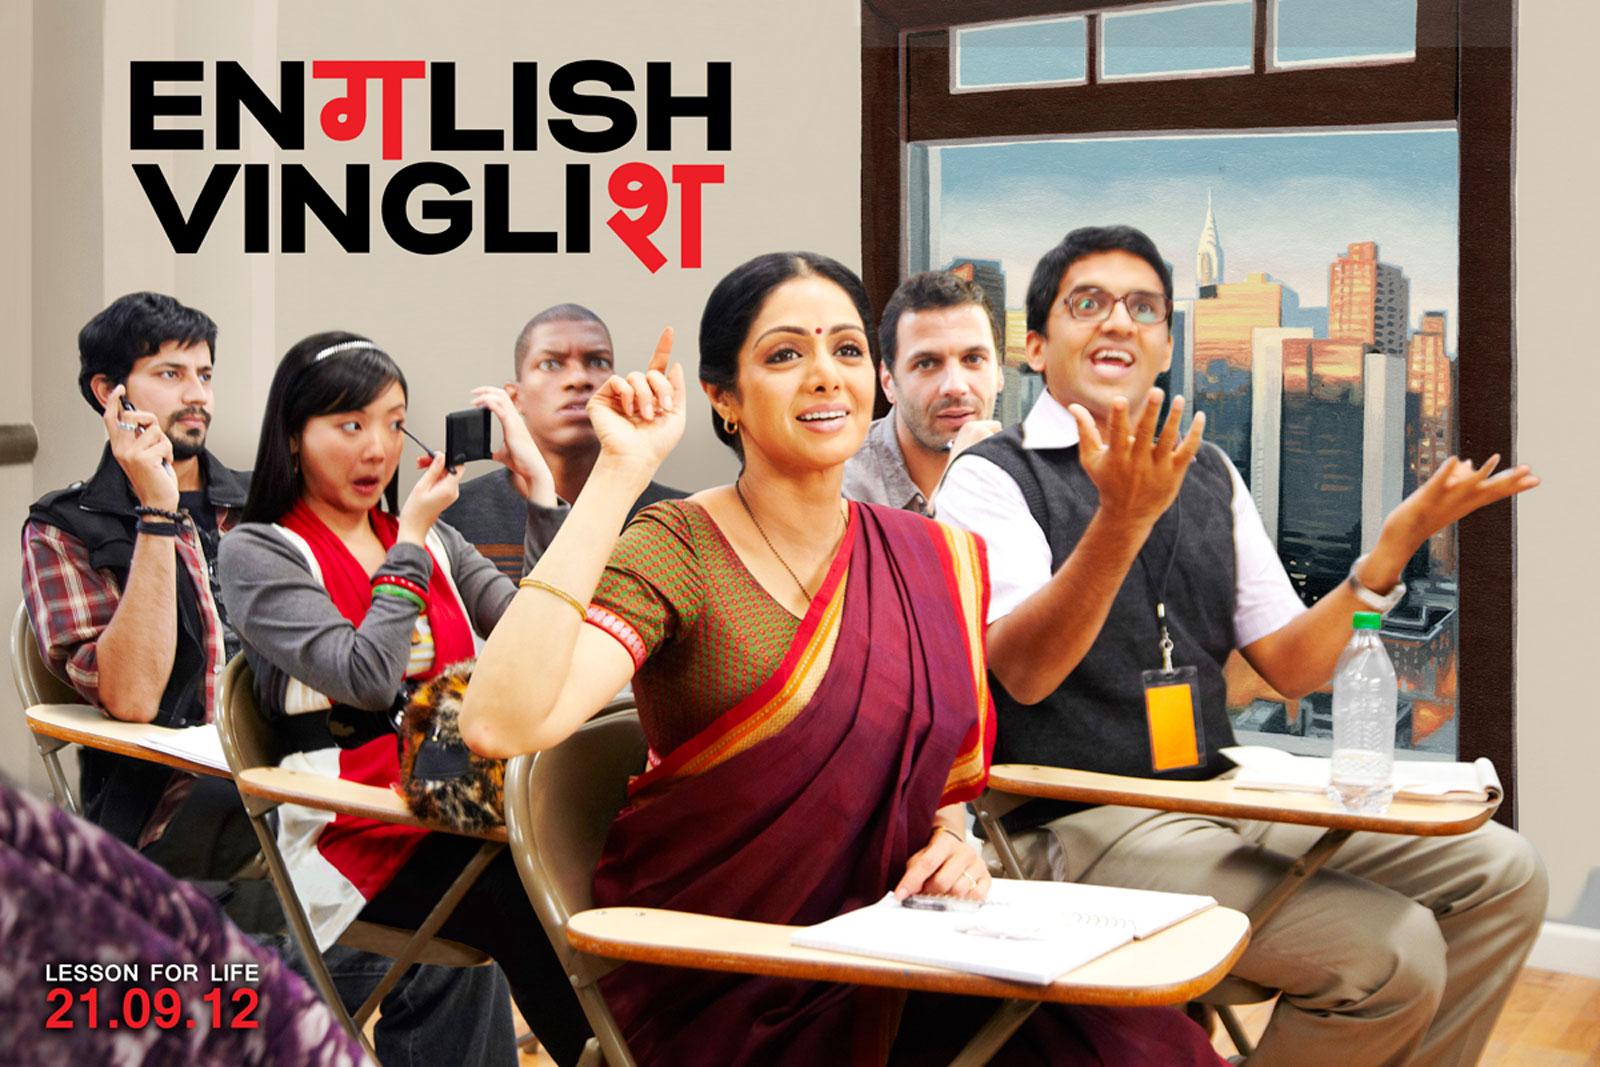 English Vinglish Movie Hd Wallpapers Posters